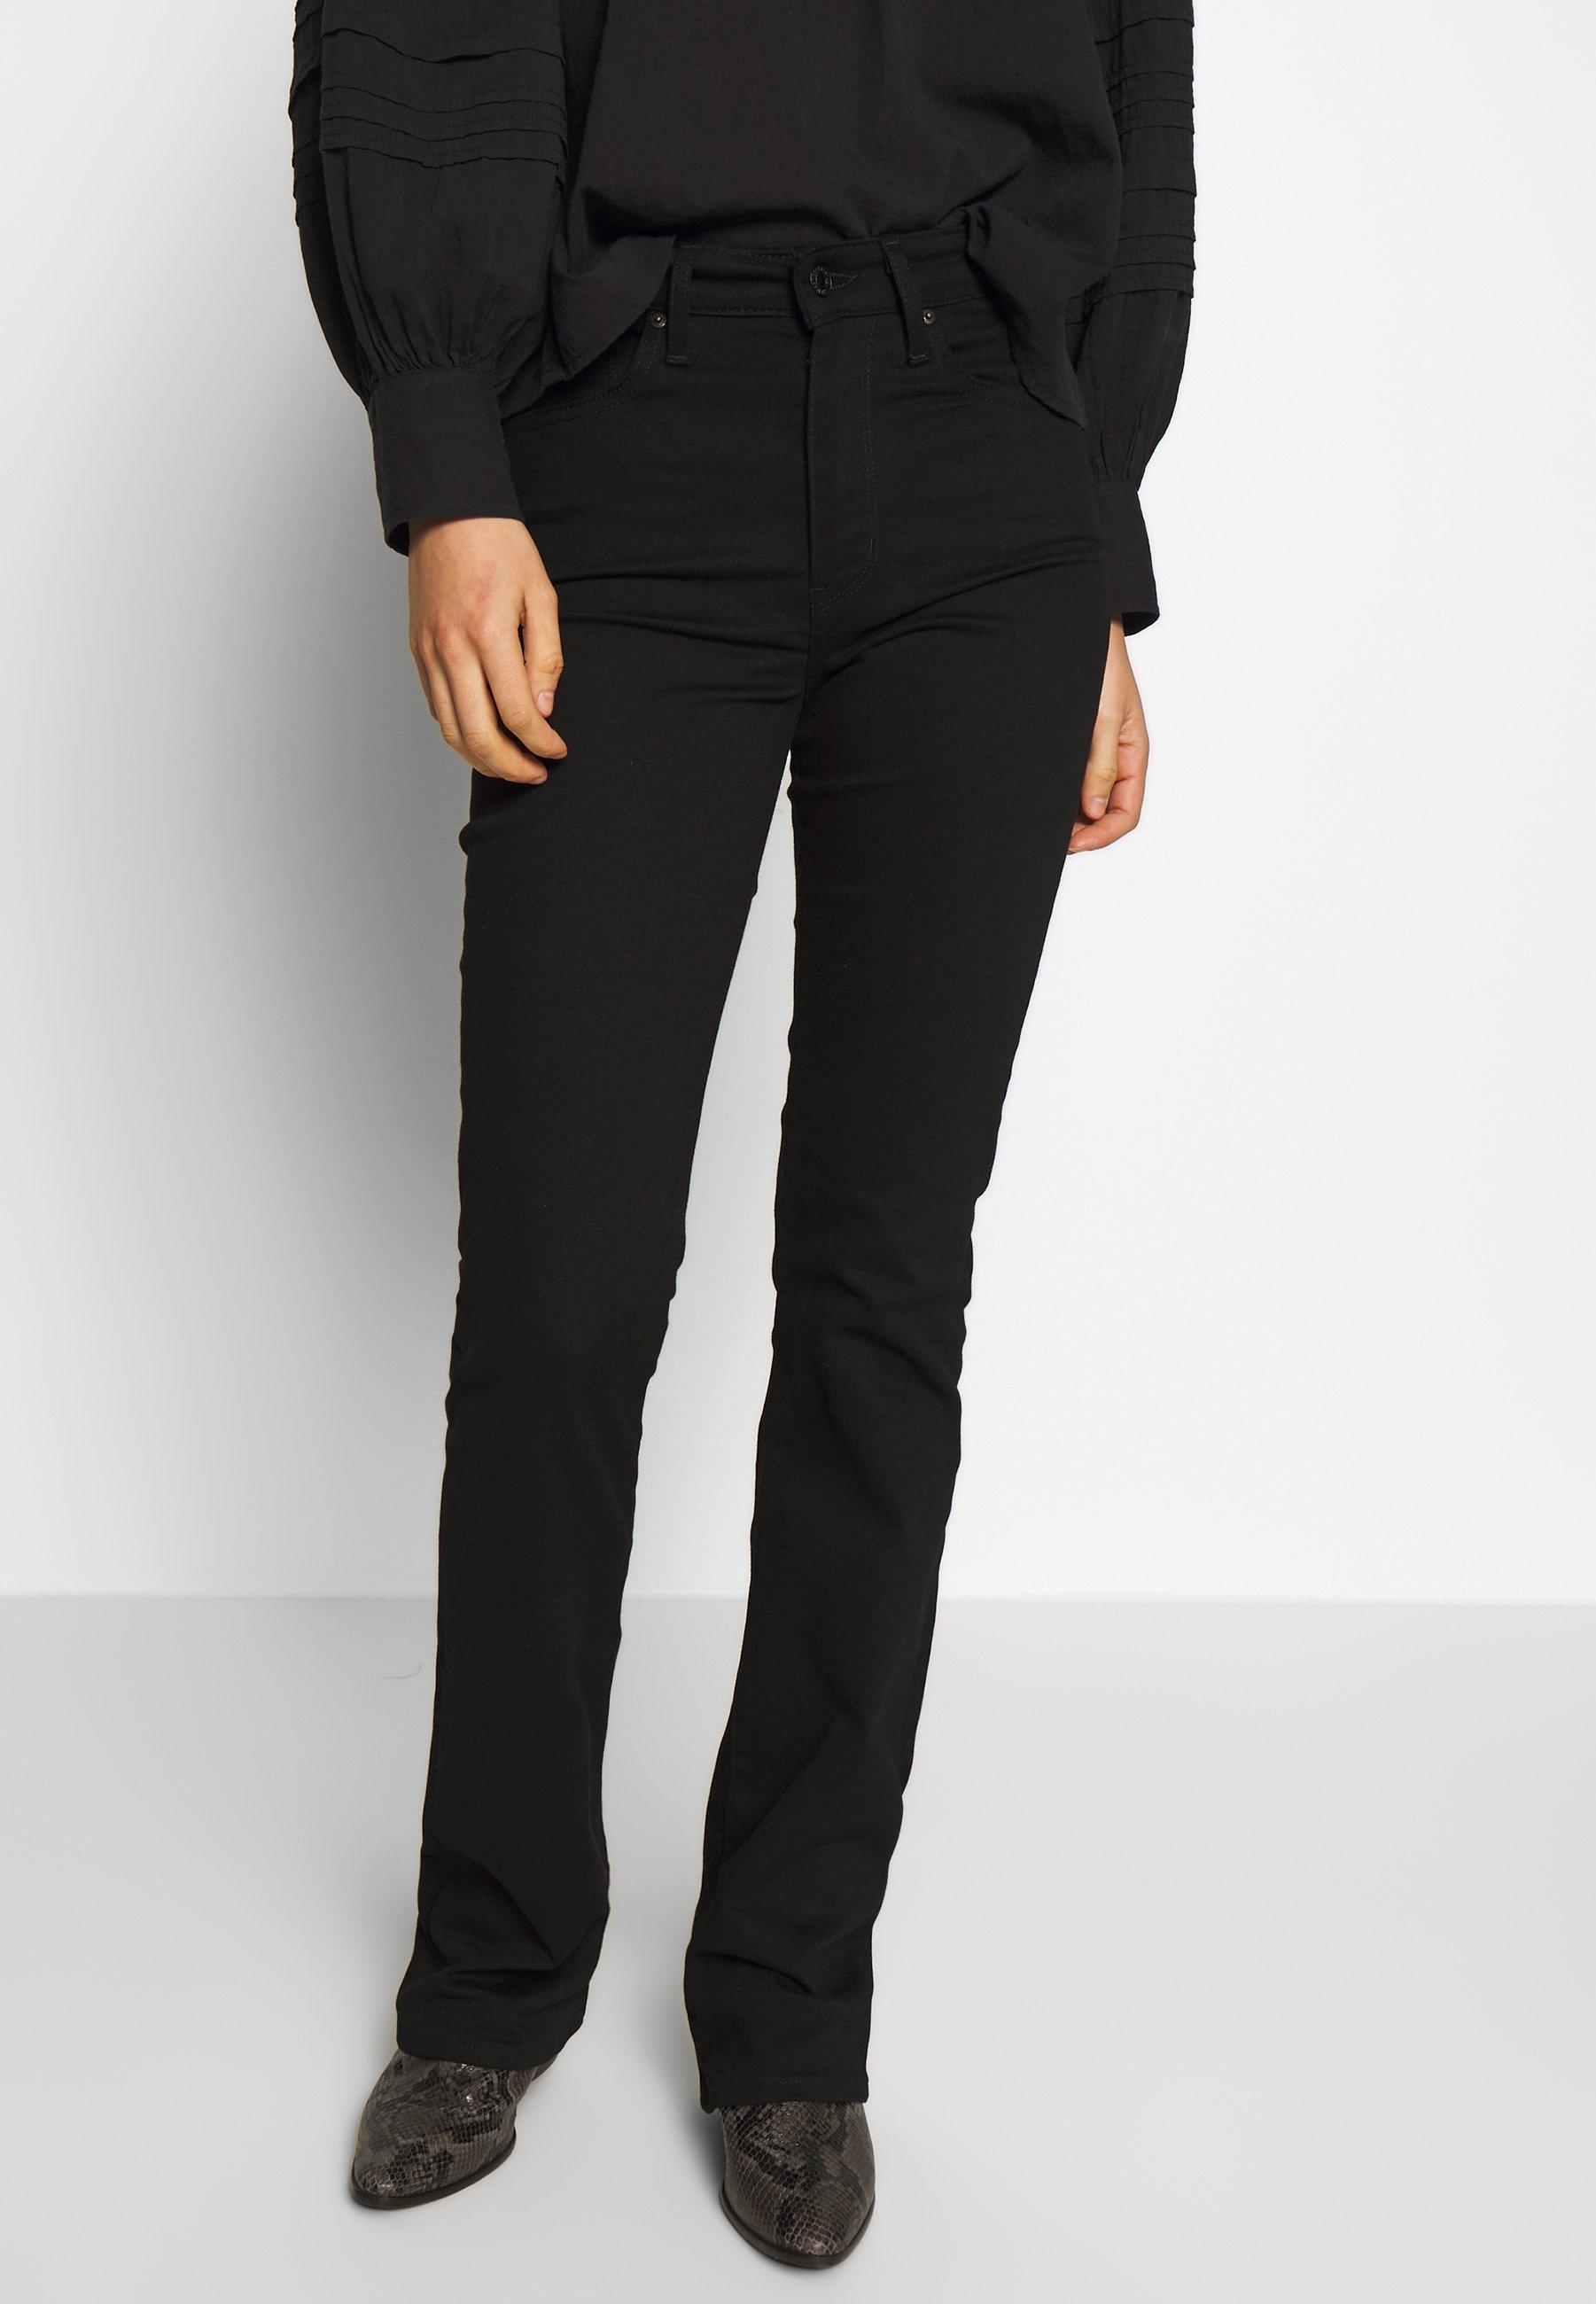 Femme 725 HIGH RISE BOOTCUT - Jean bootcut